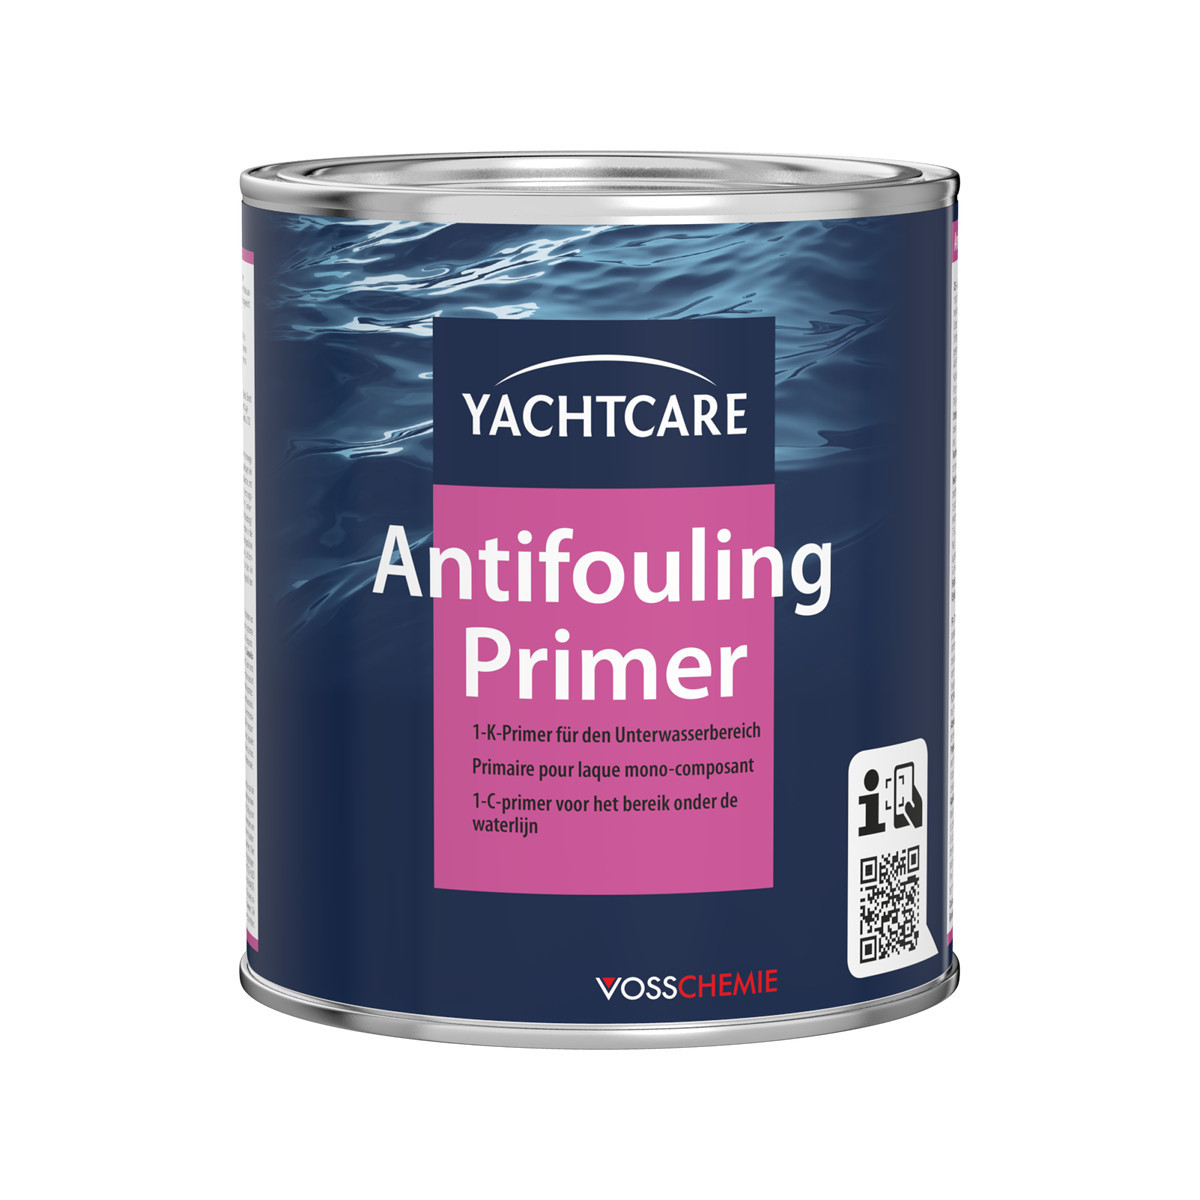 Yachtcare Antifouling Primer - grijs, 750ml